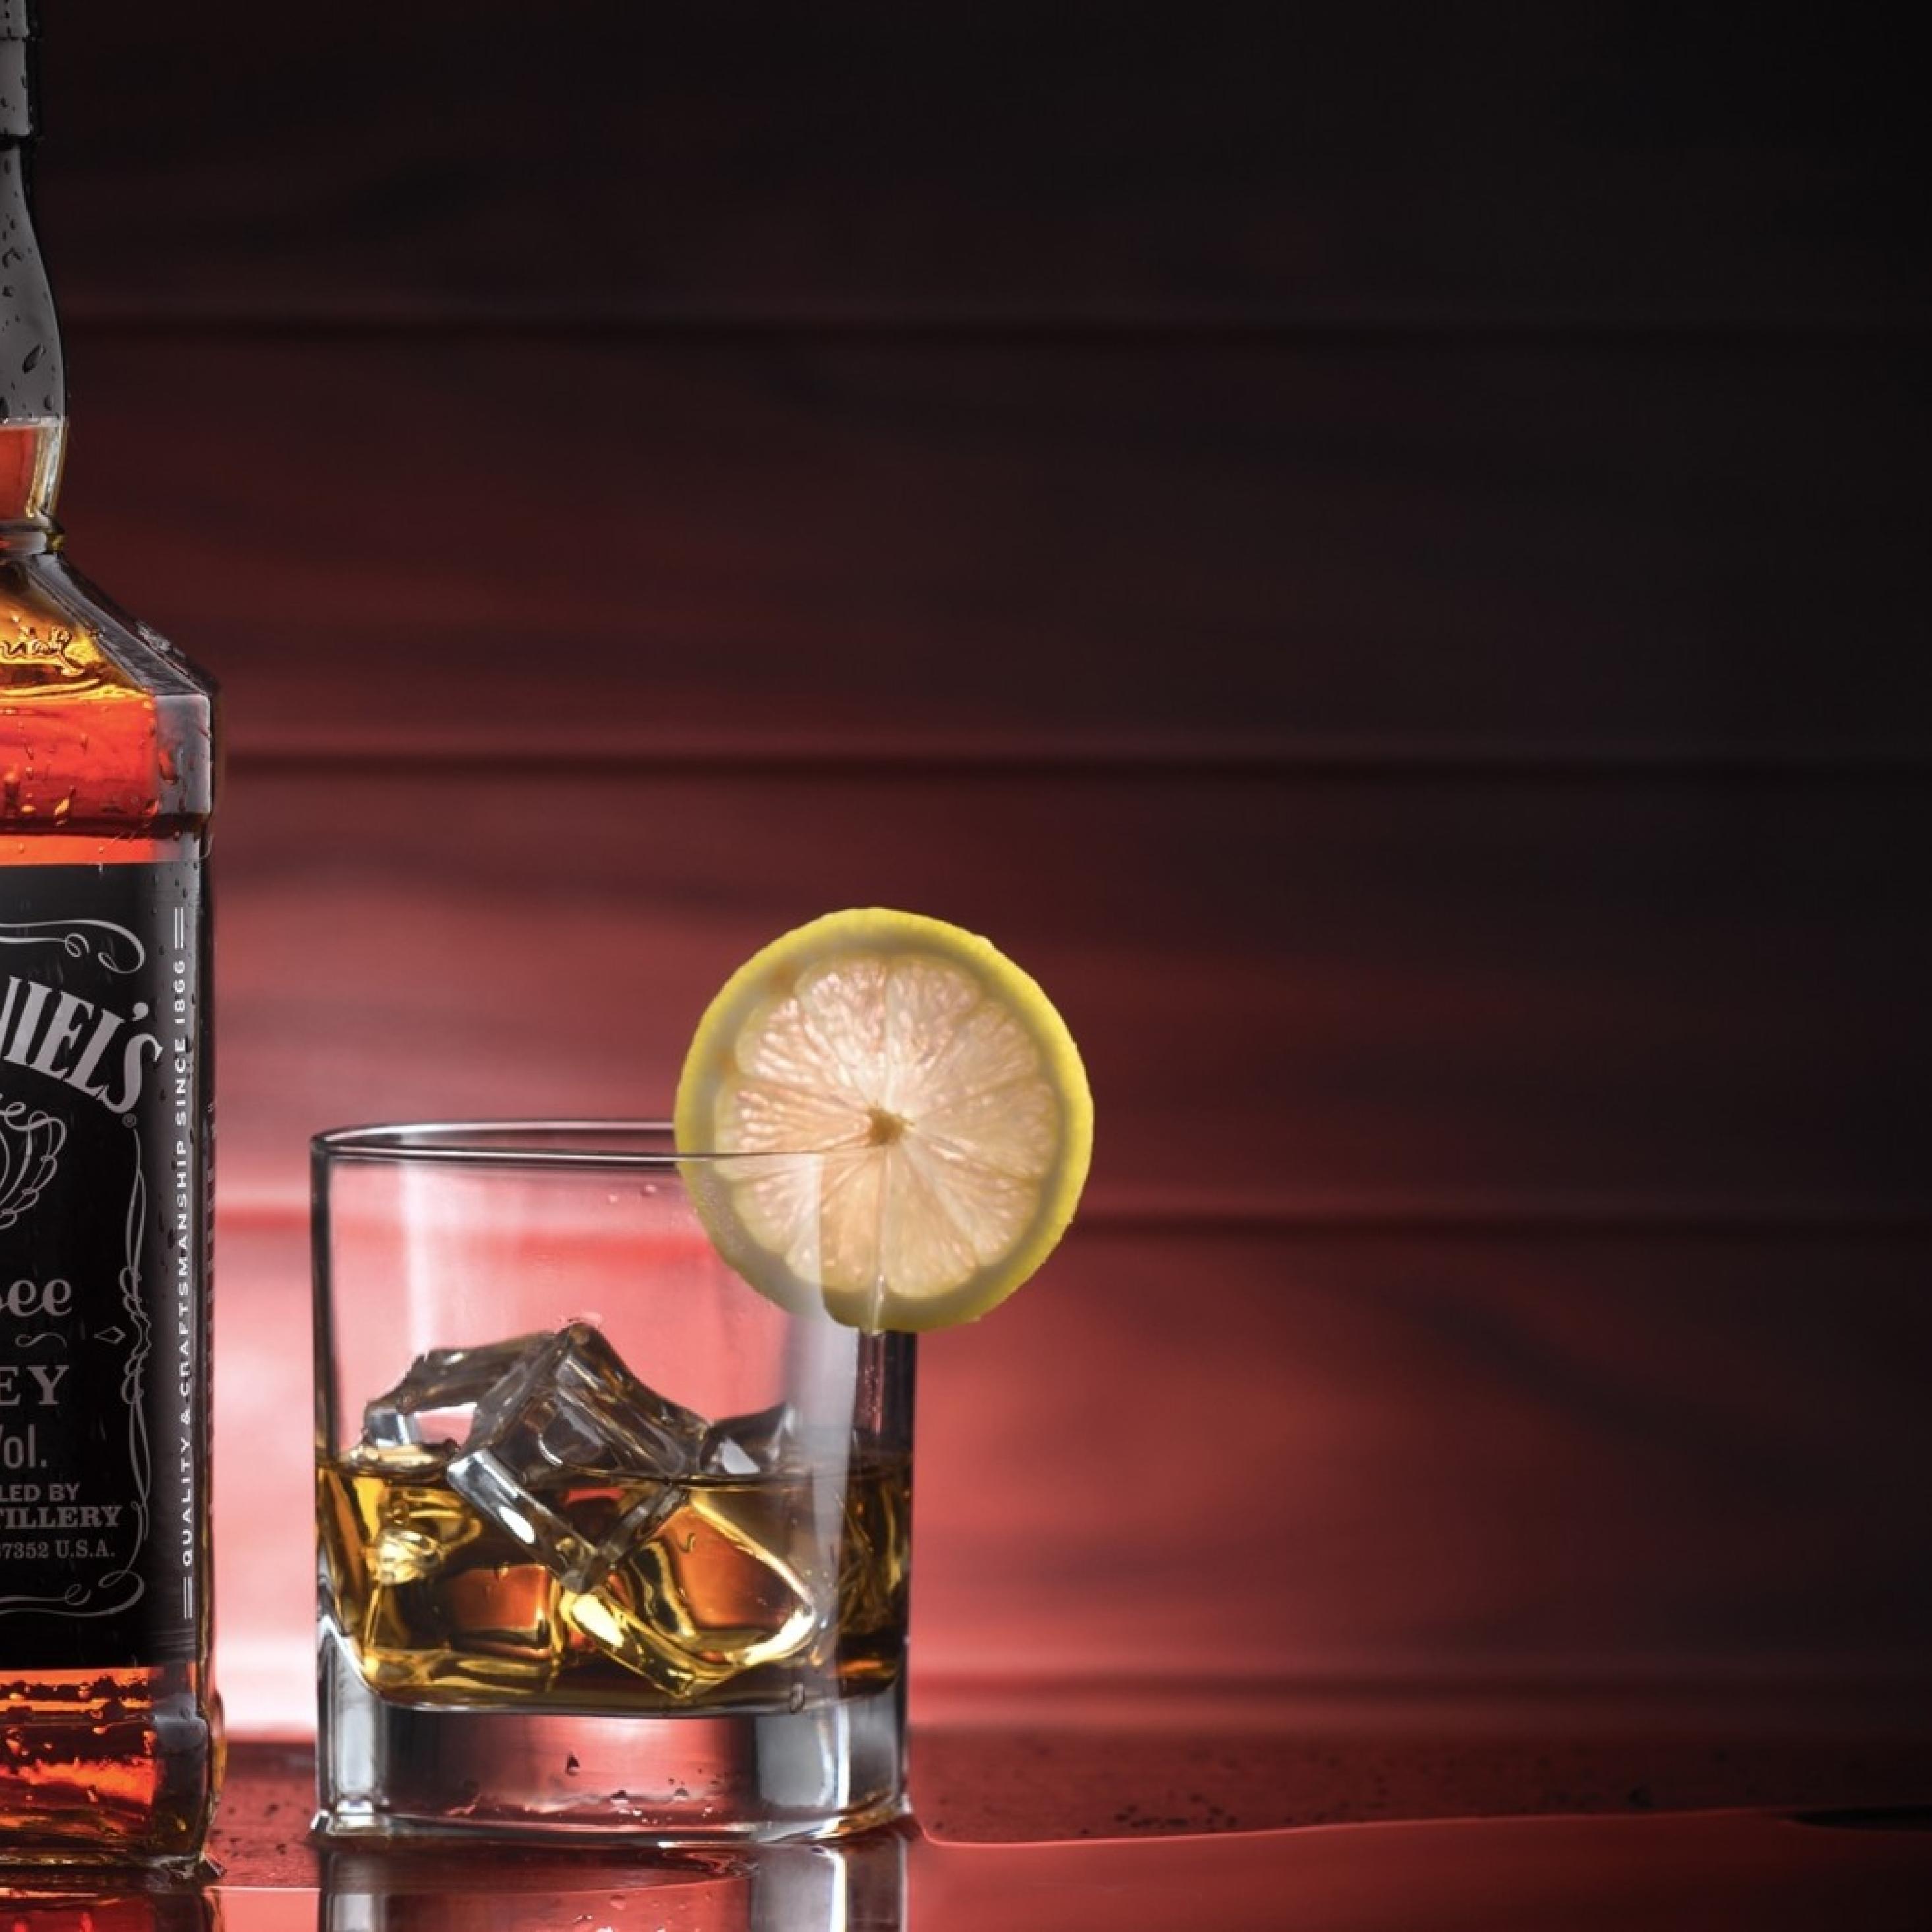 Jack Daniels, Whiskey, Glass, Full HD Wallpaper